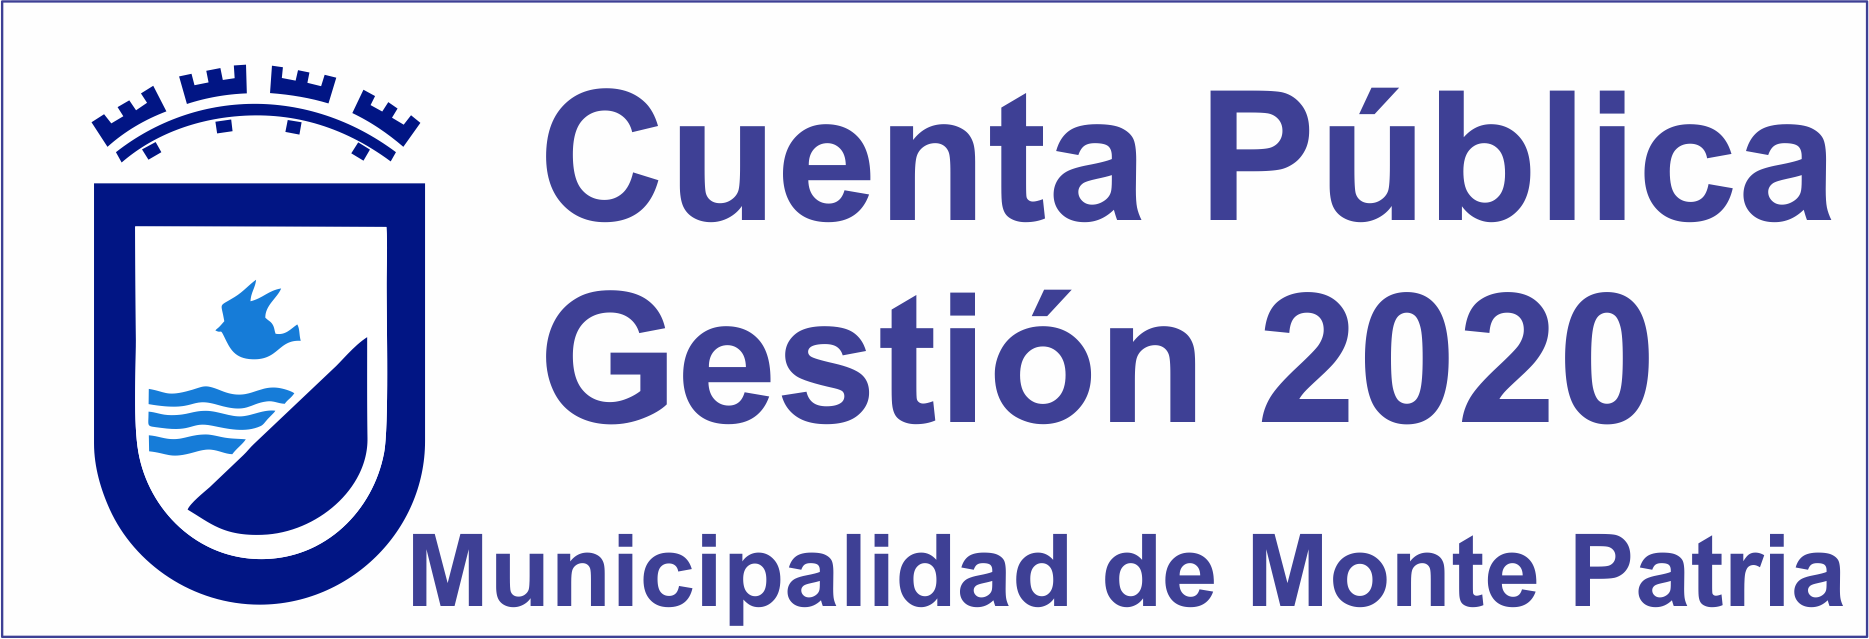 Cuenta Pública 2021